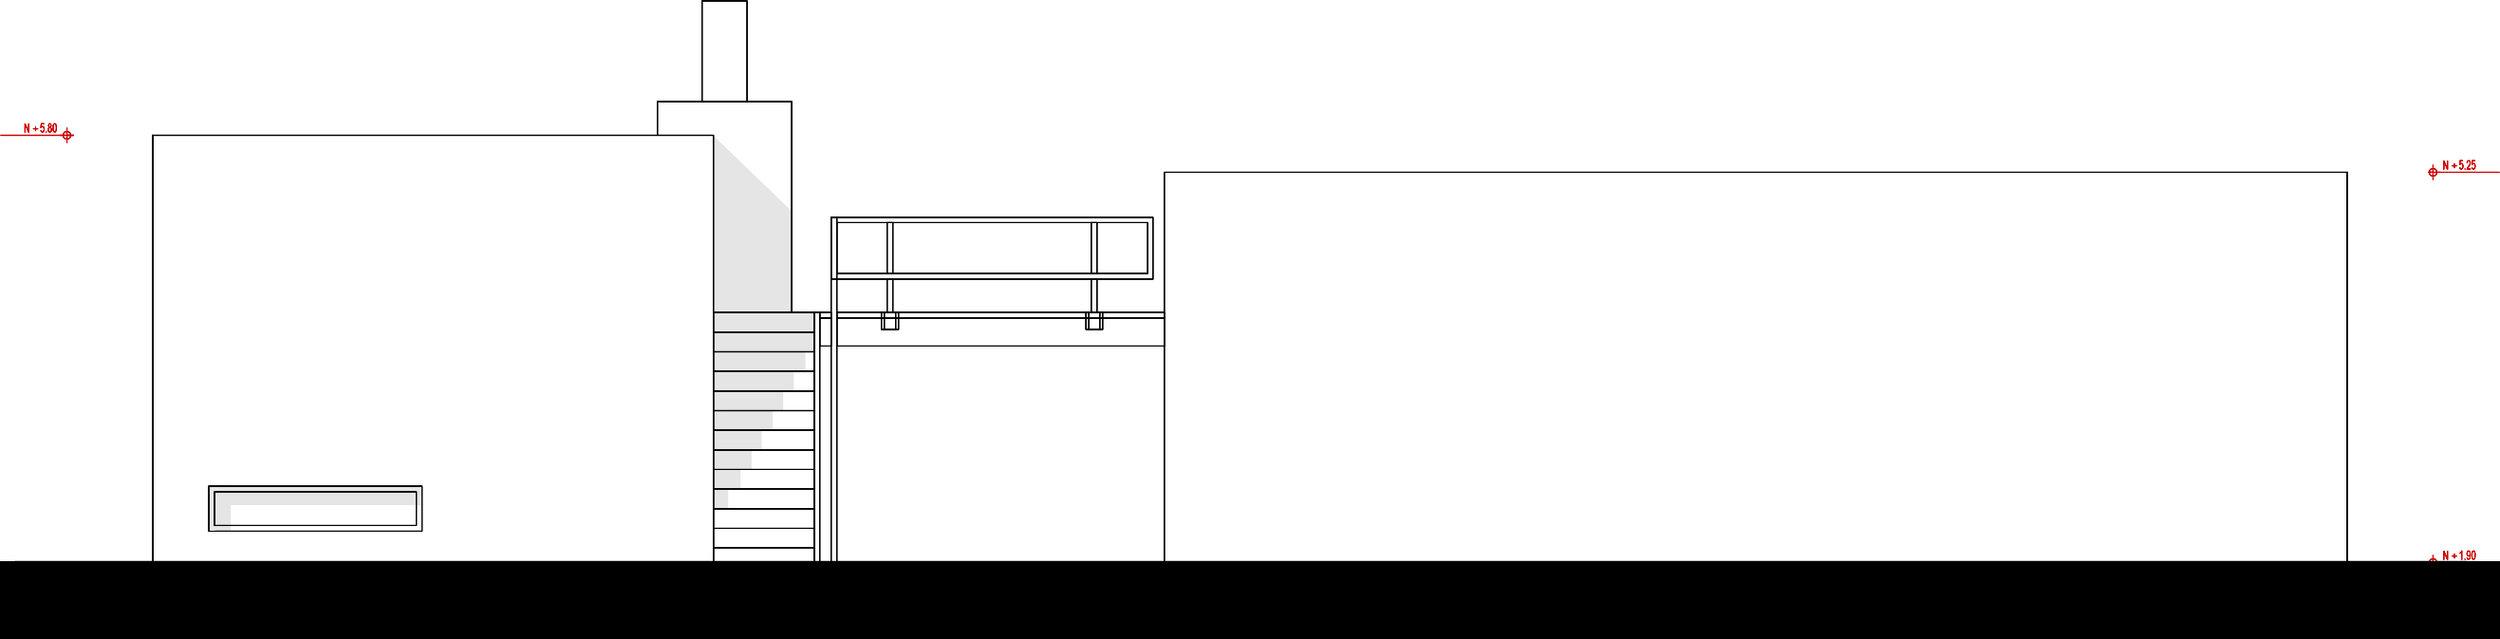 rg-alzado 4.jpg